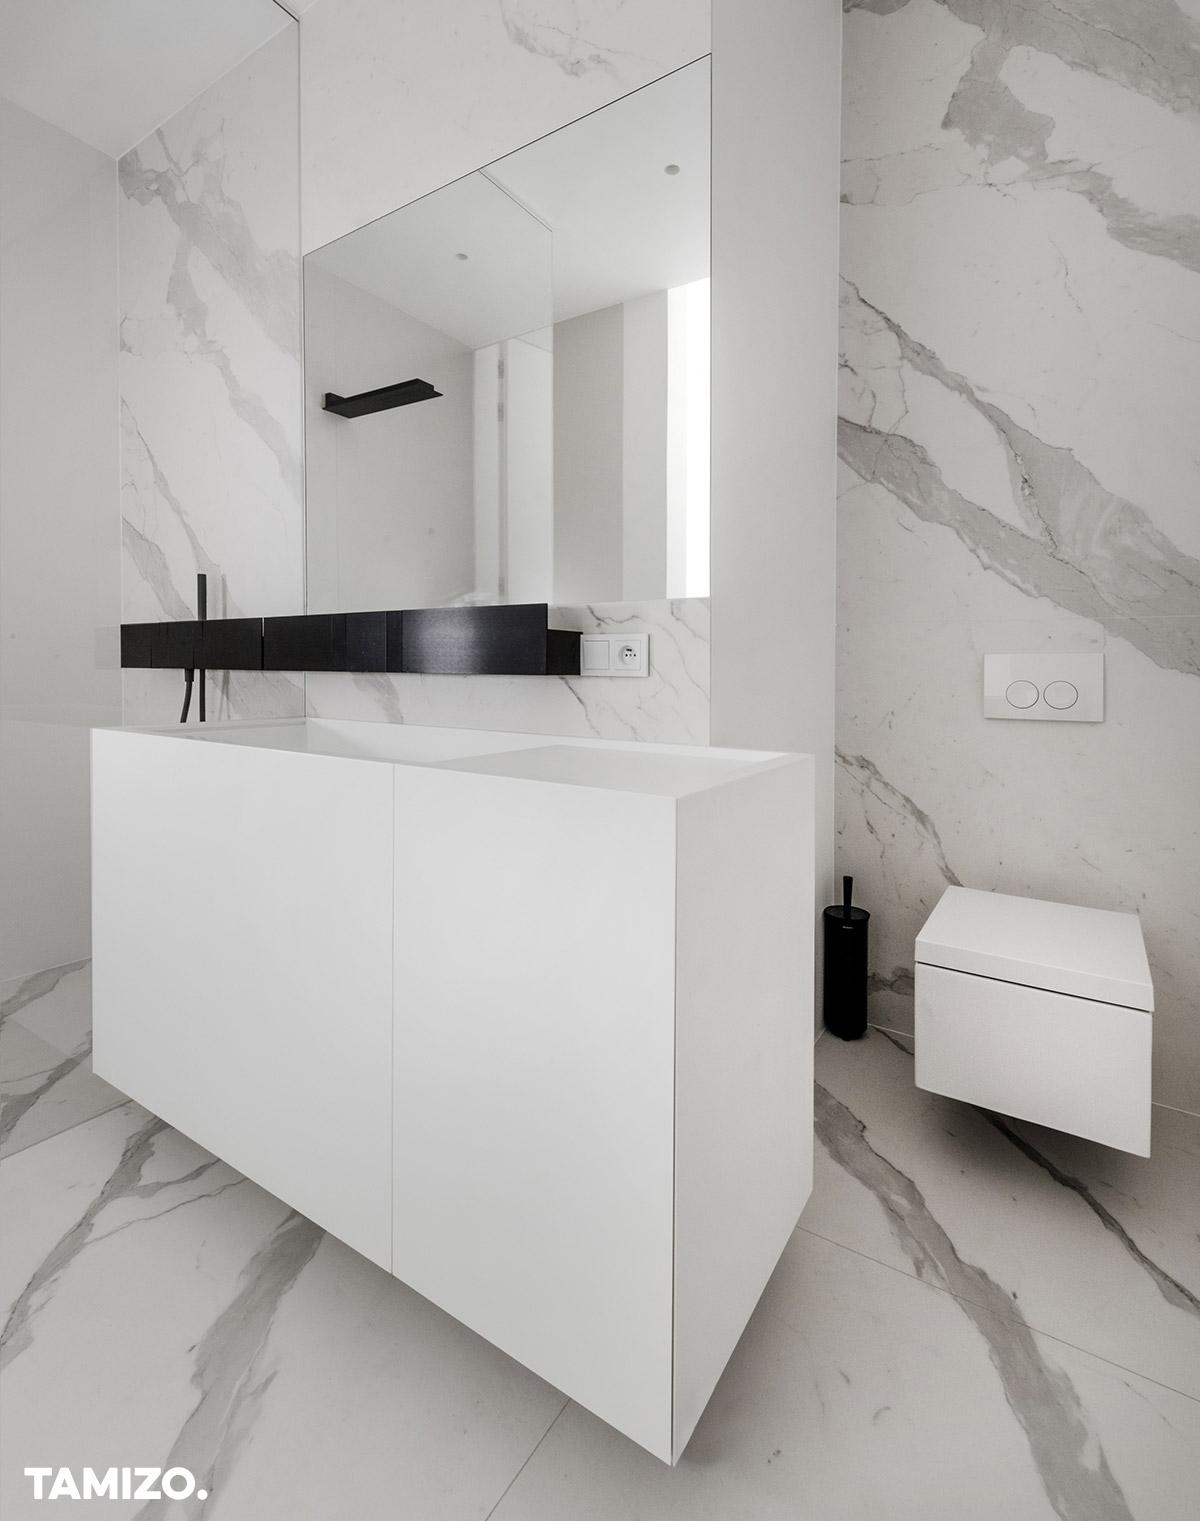 037_tamizo_architects_interior_house_realization_warsaw_poland_52